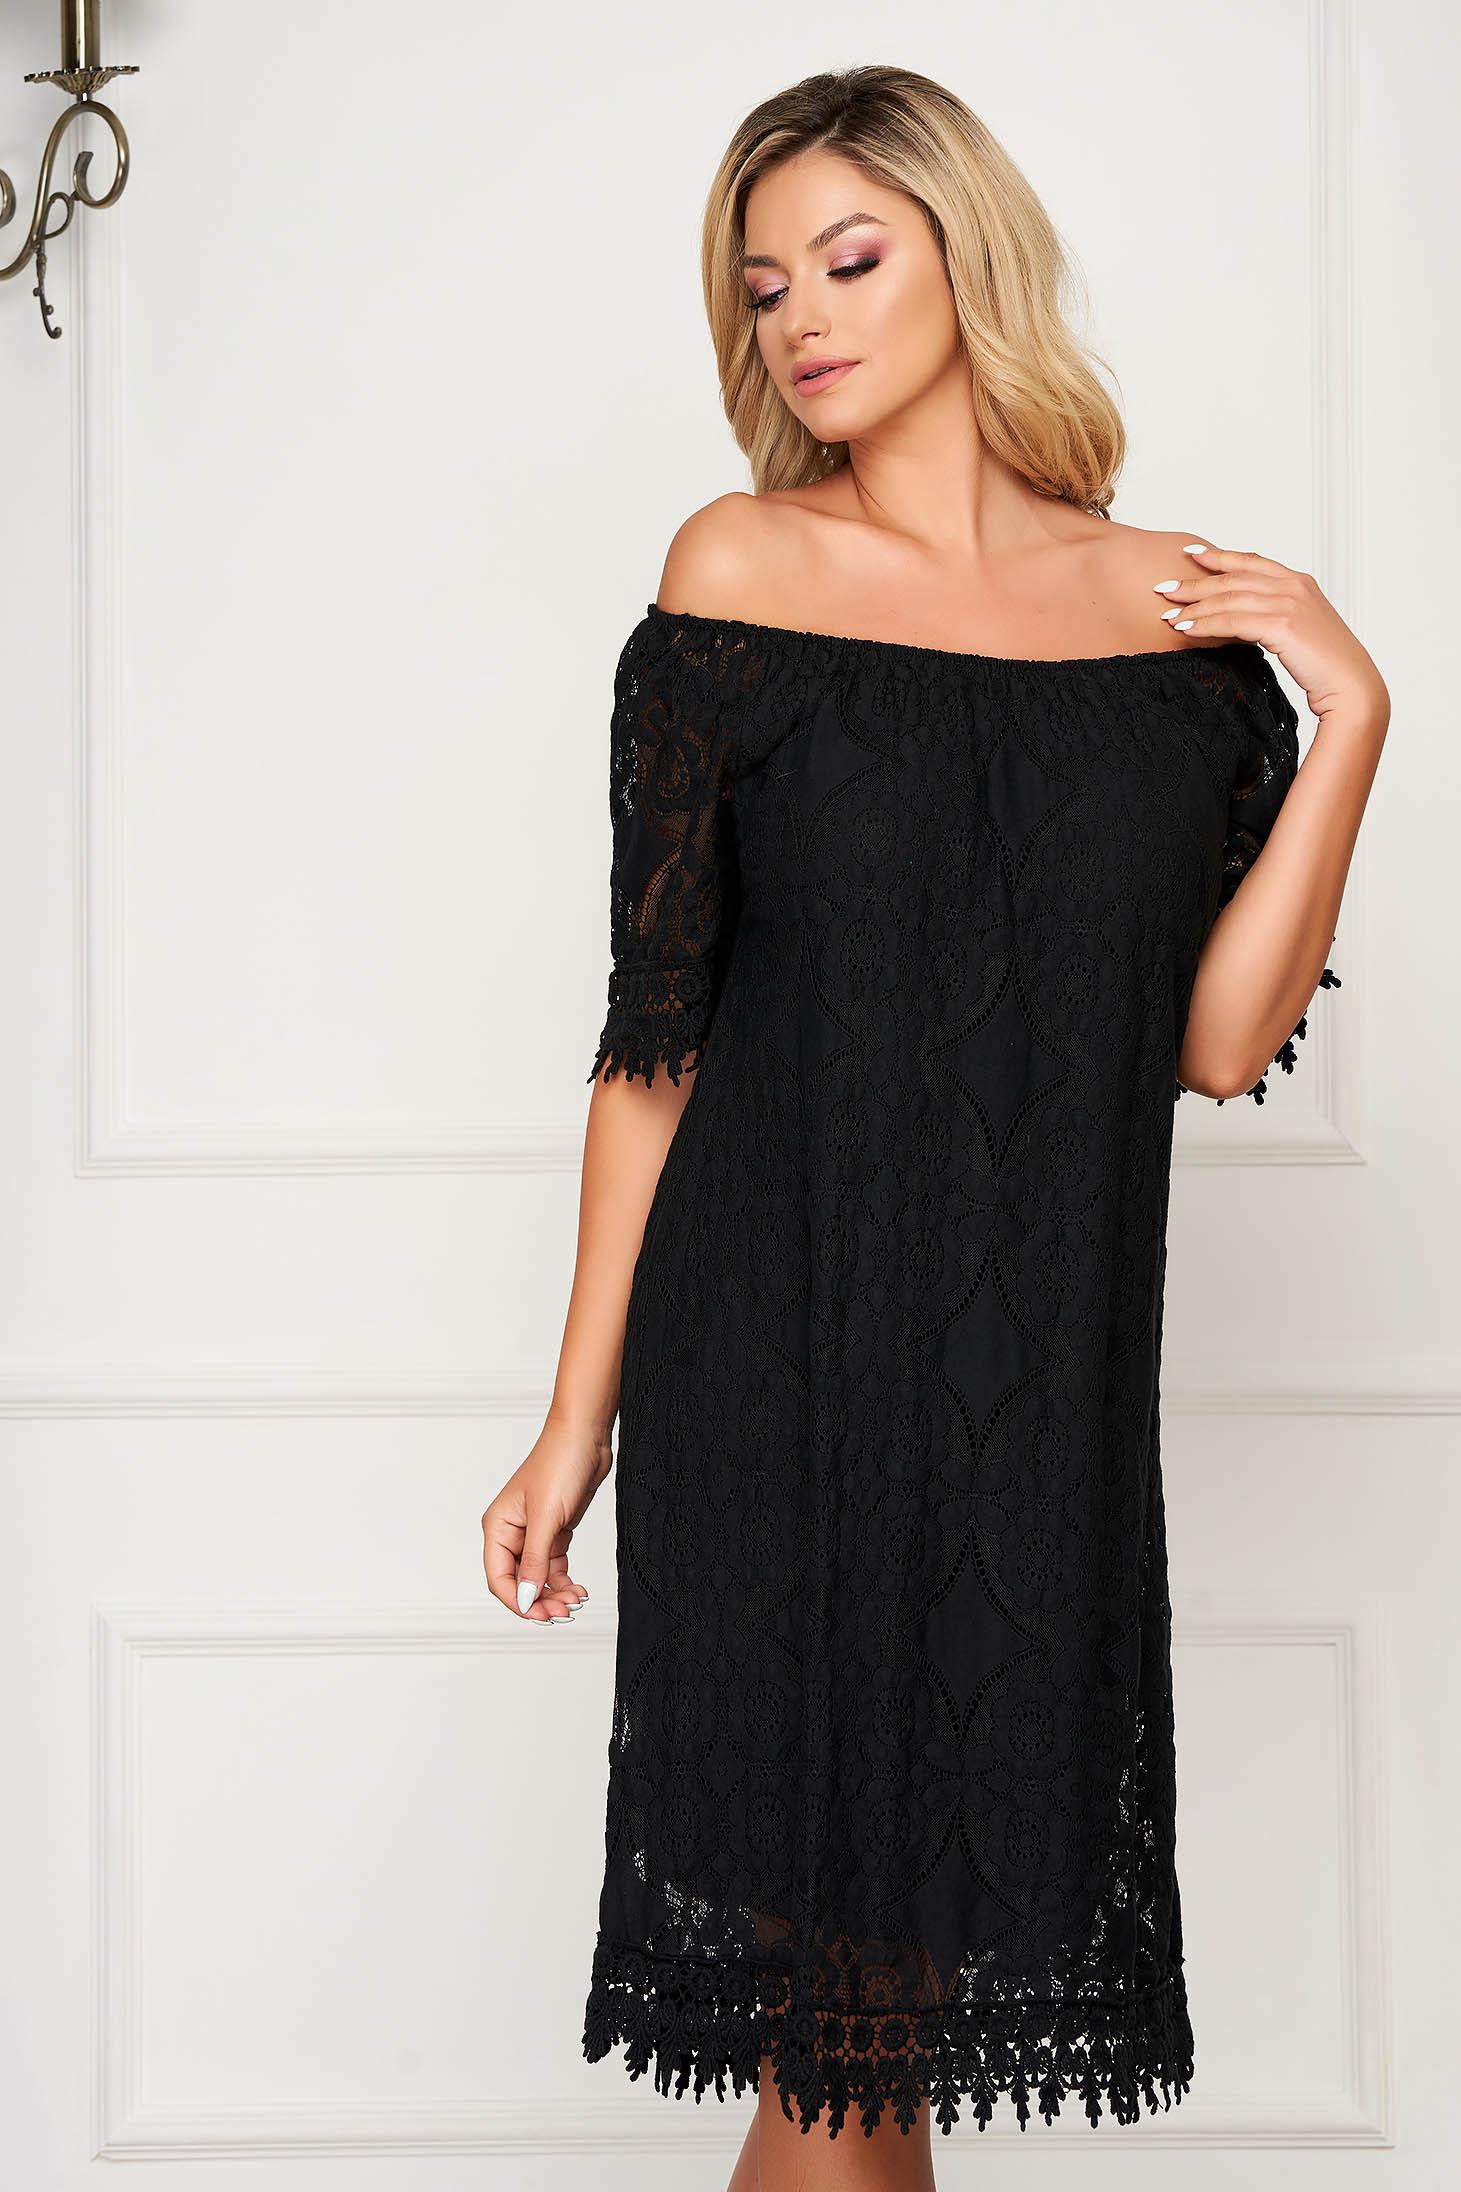 Black dress short cut daily flared laced off-shoulder